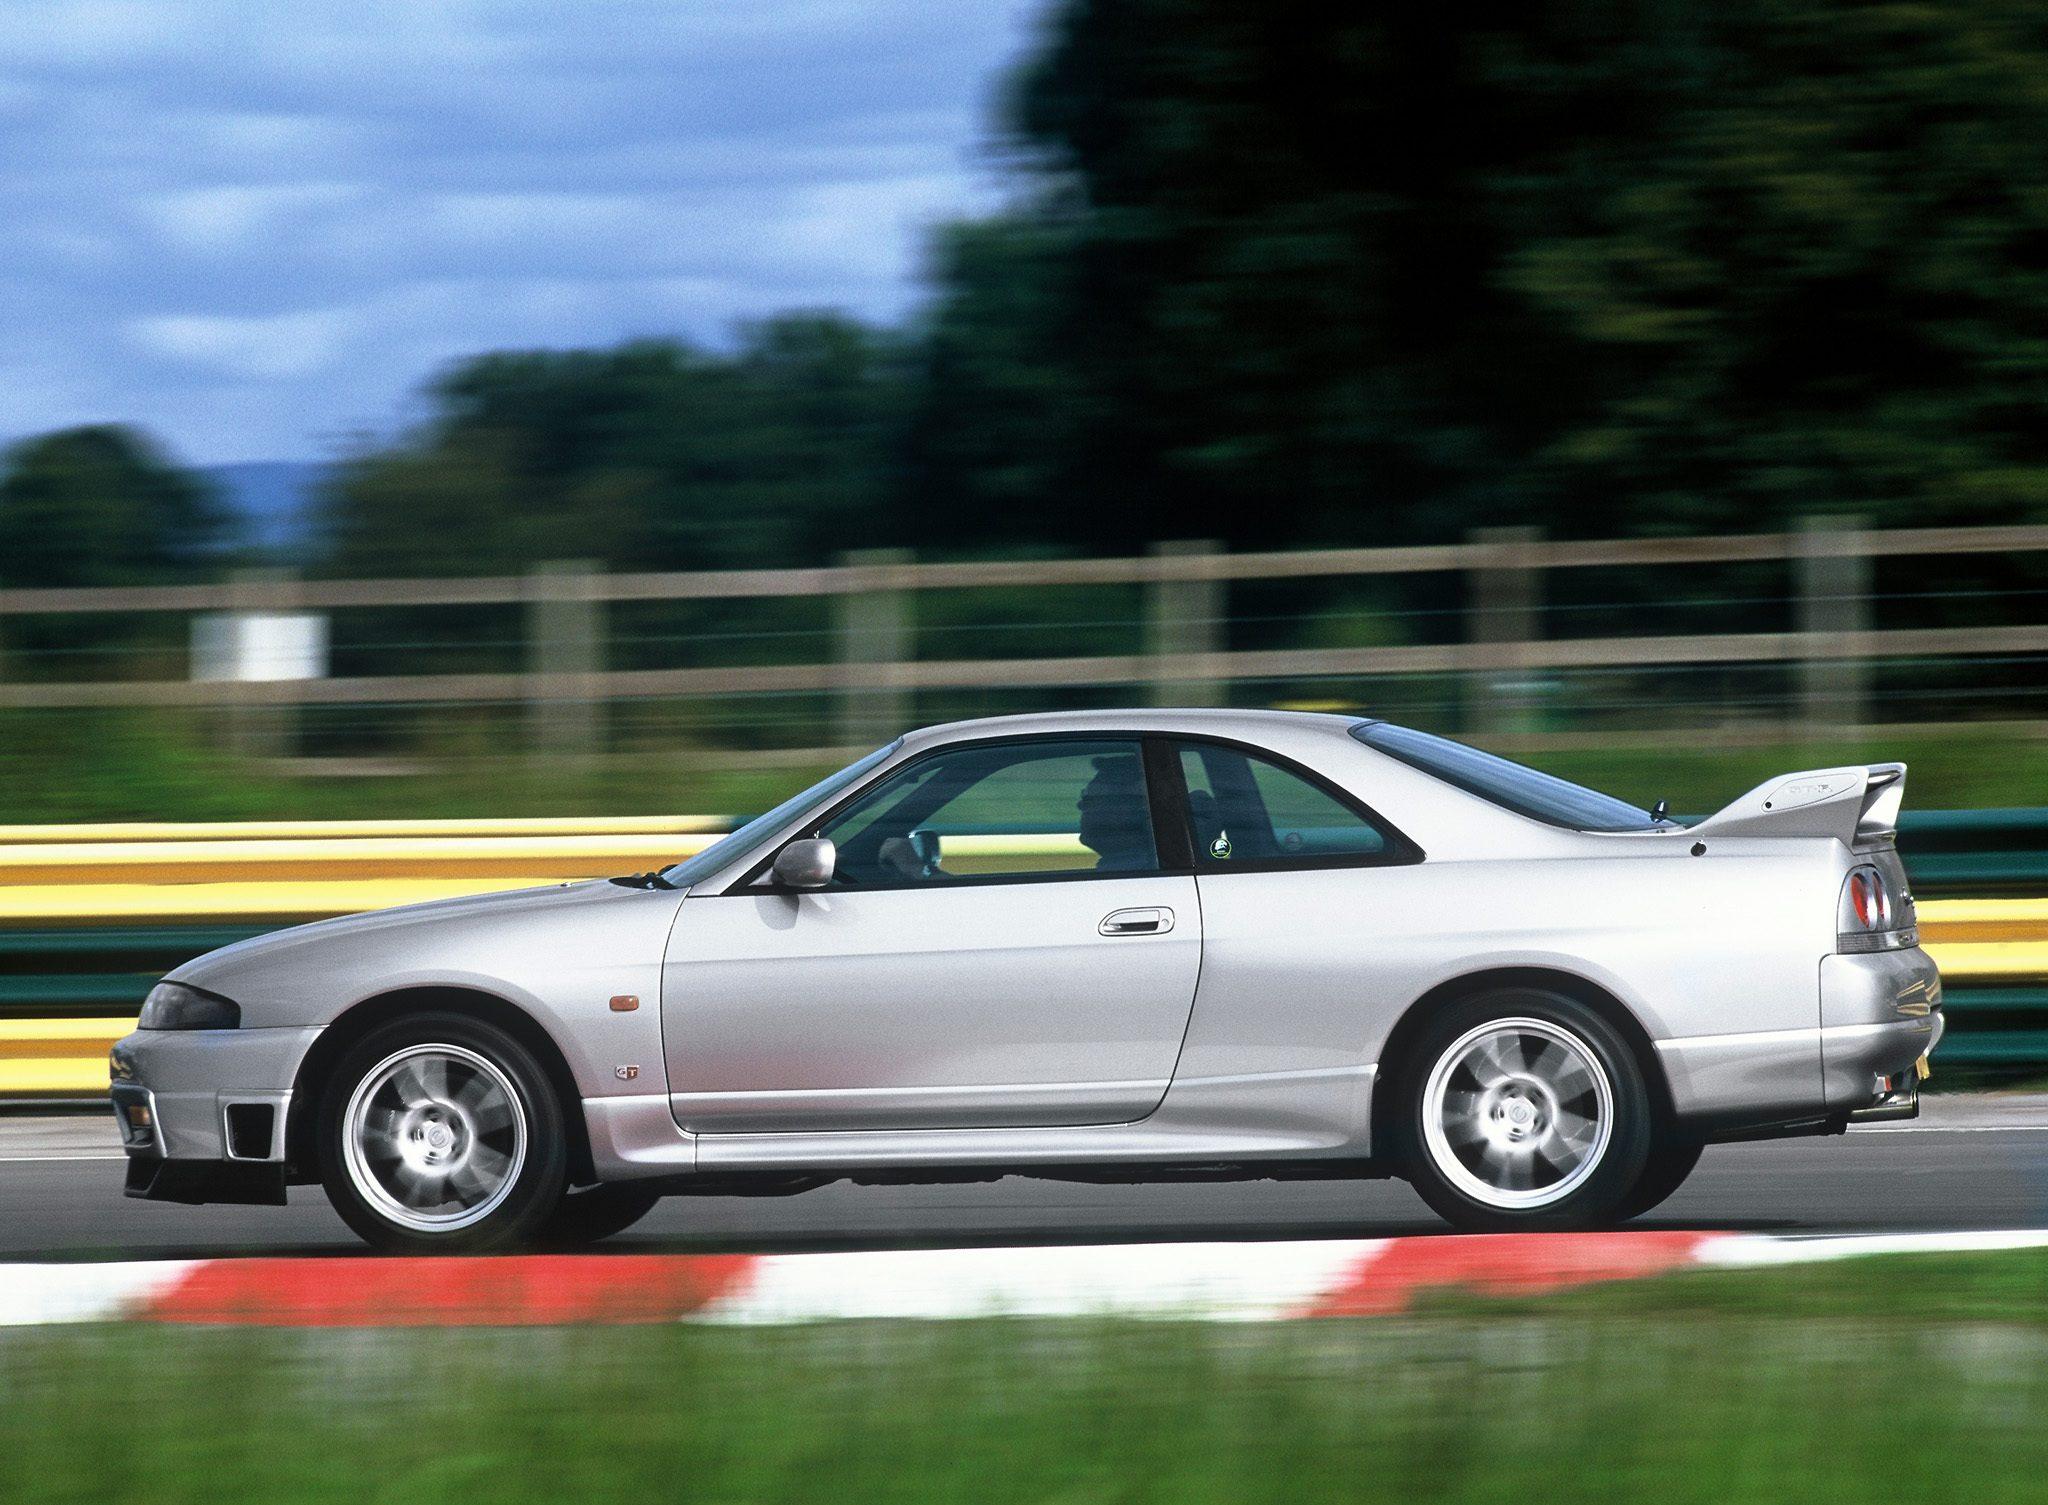 1995 Nissan Skyline R33 V-Spec